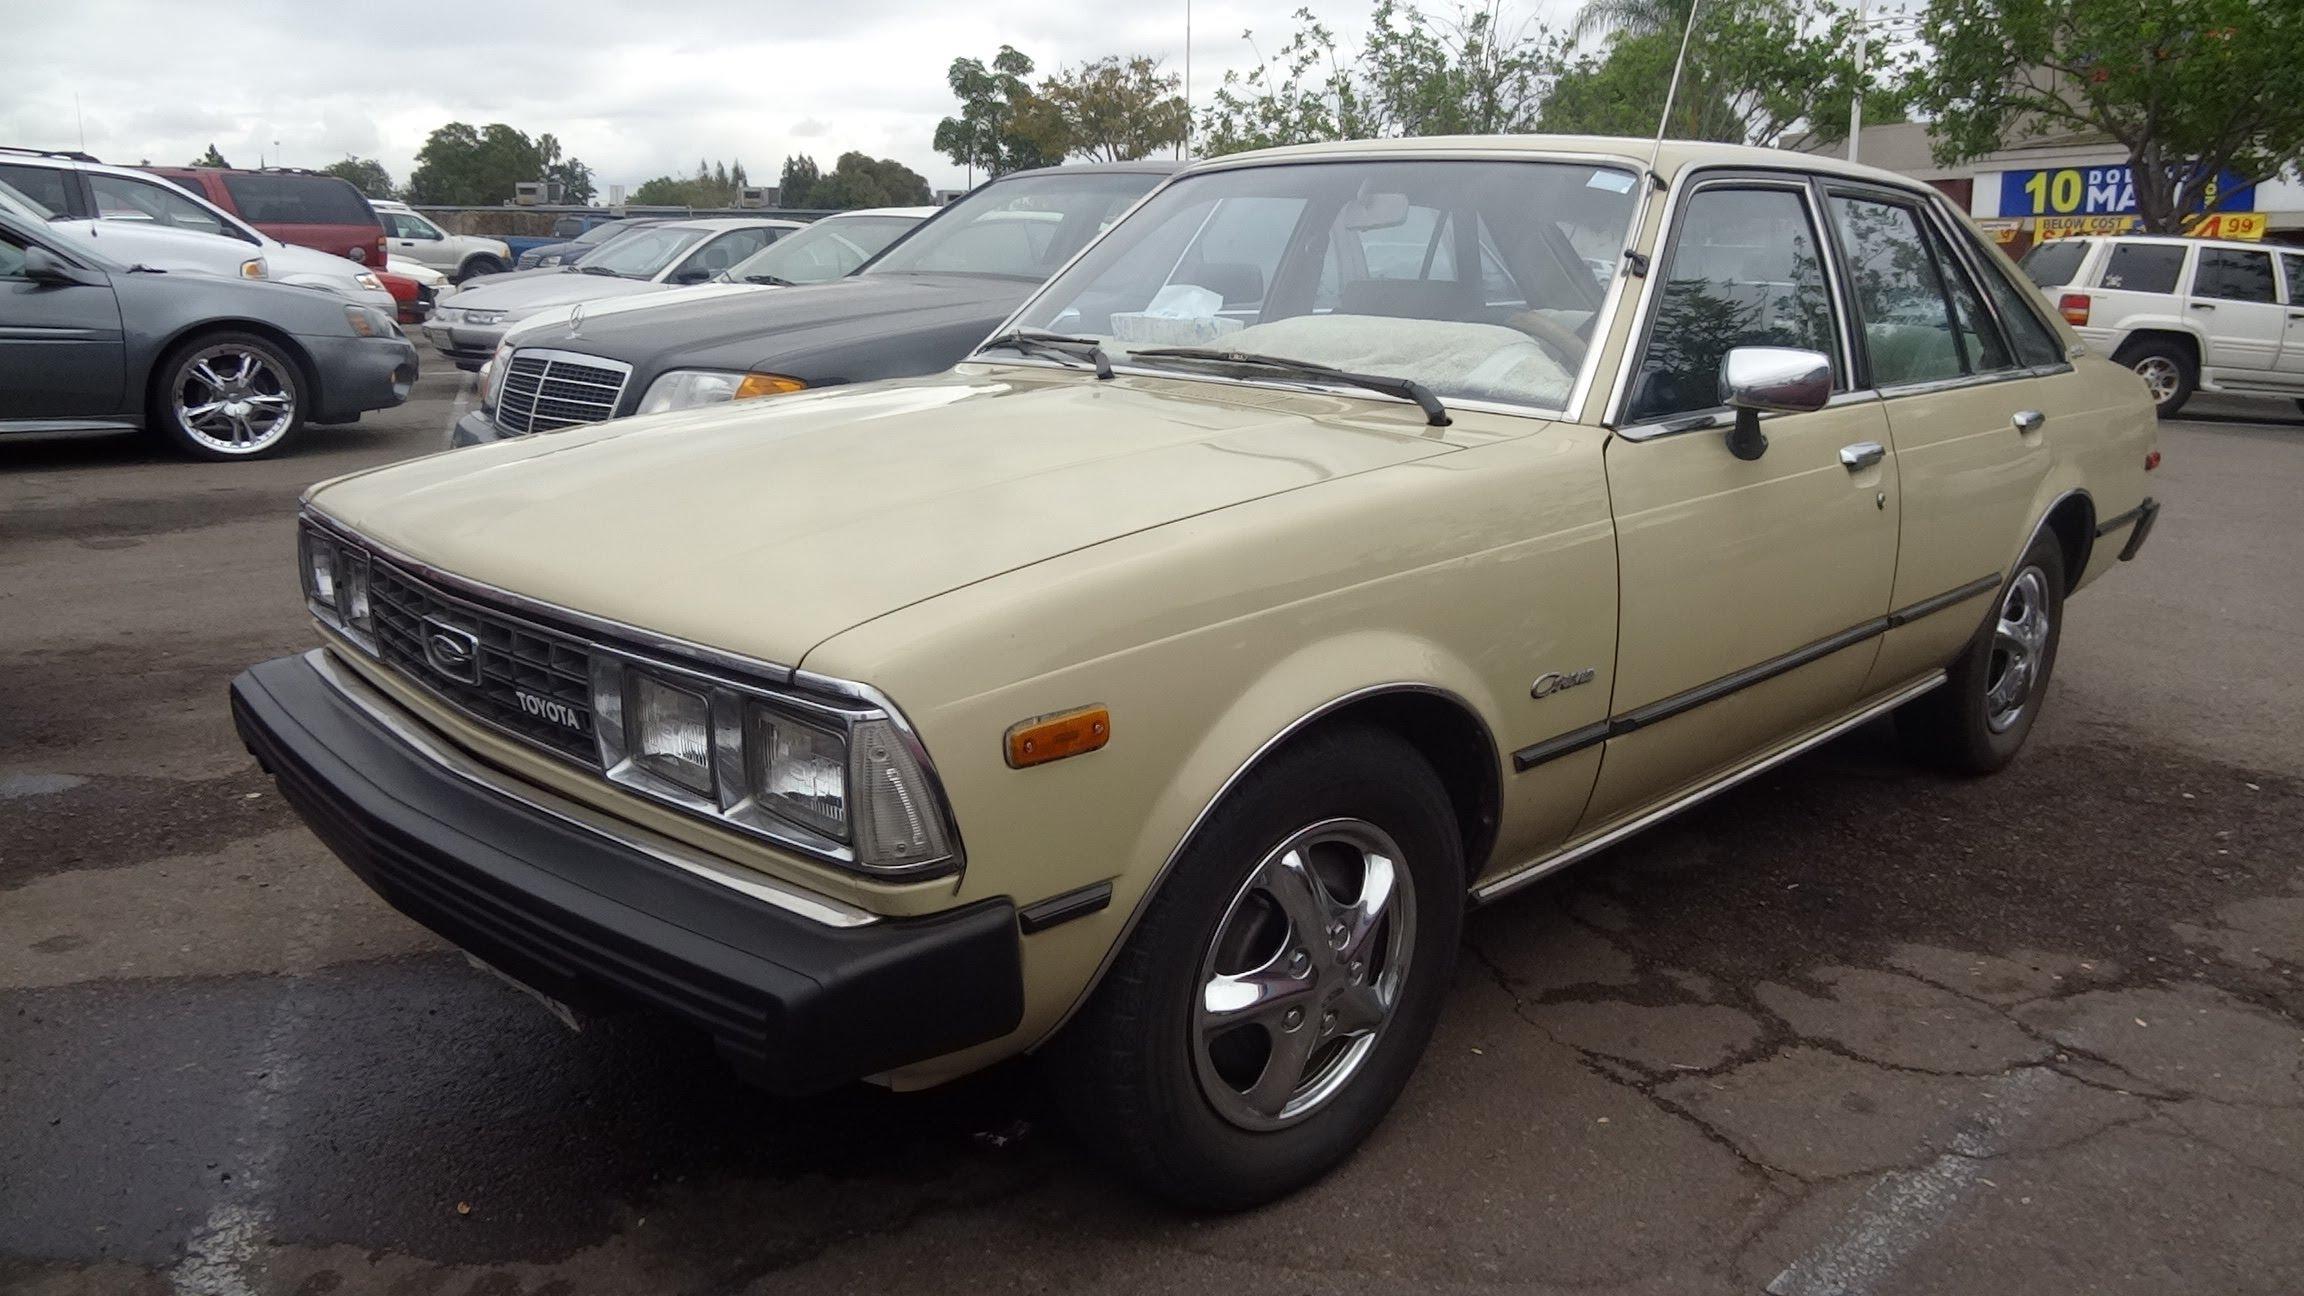 Toyota Corona VI (T130) 1979 - 1981 Liftback #2